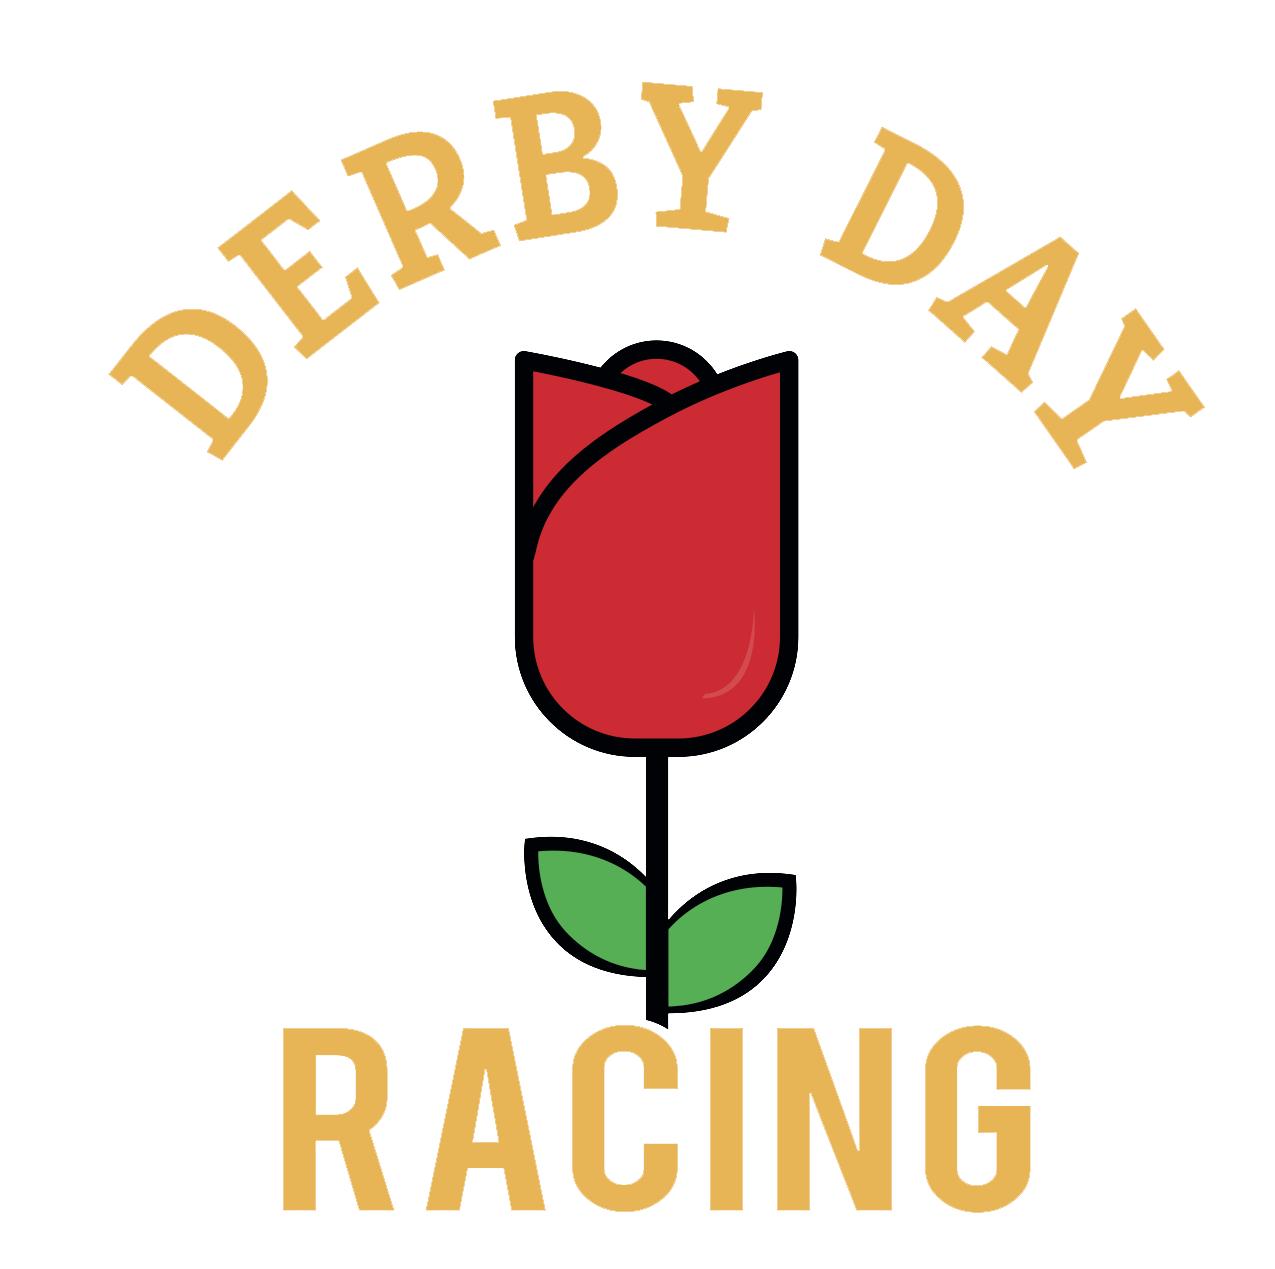 Race clipart demolition derby. Kentucky at getdrawings com